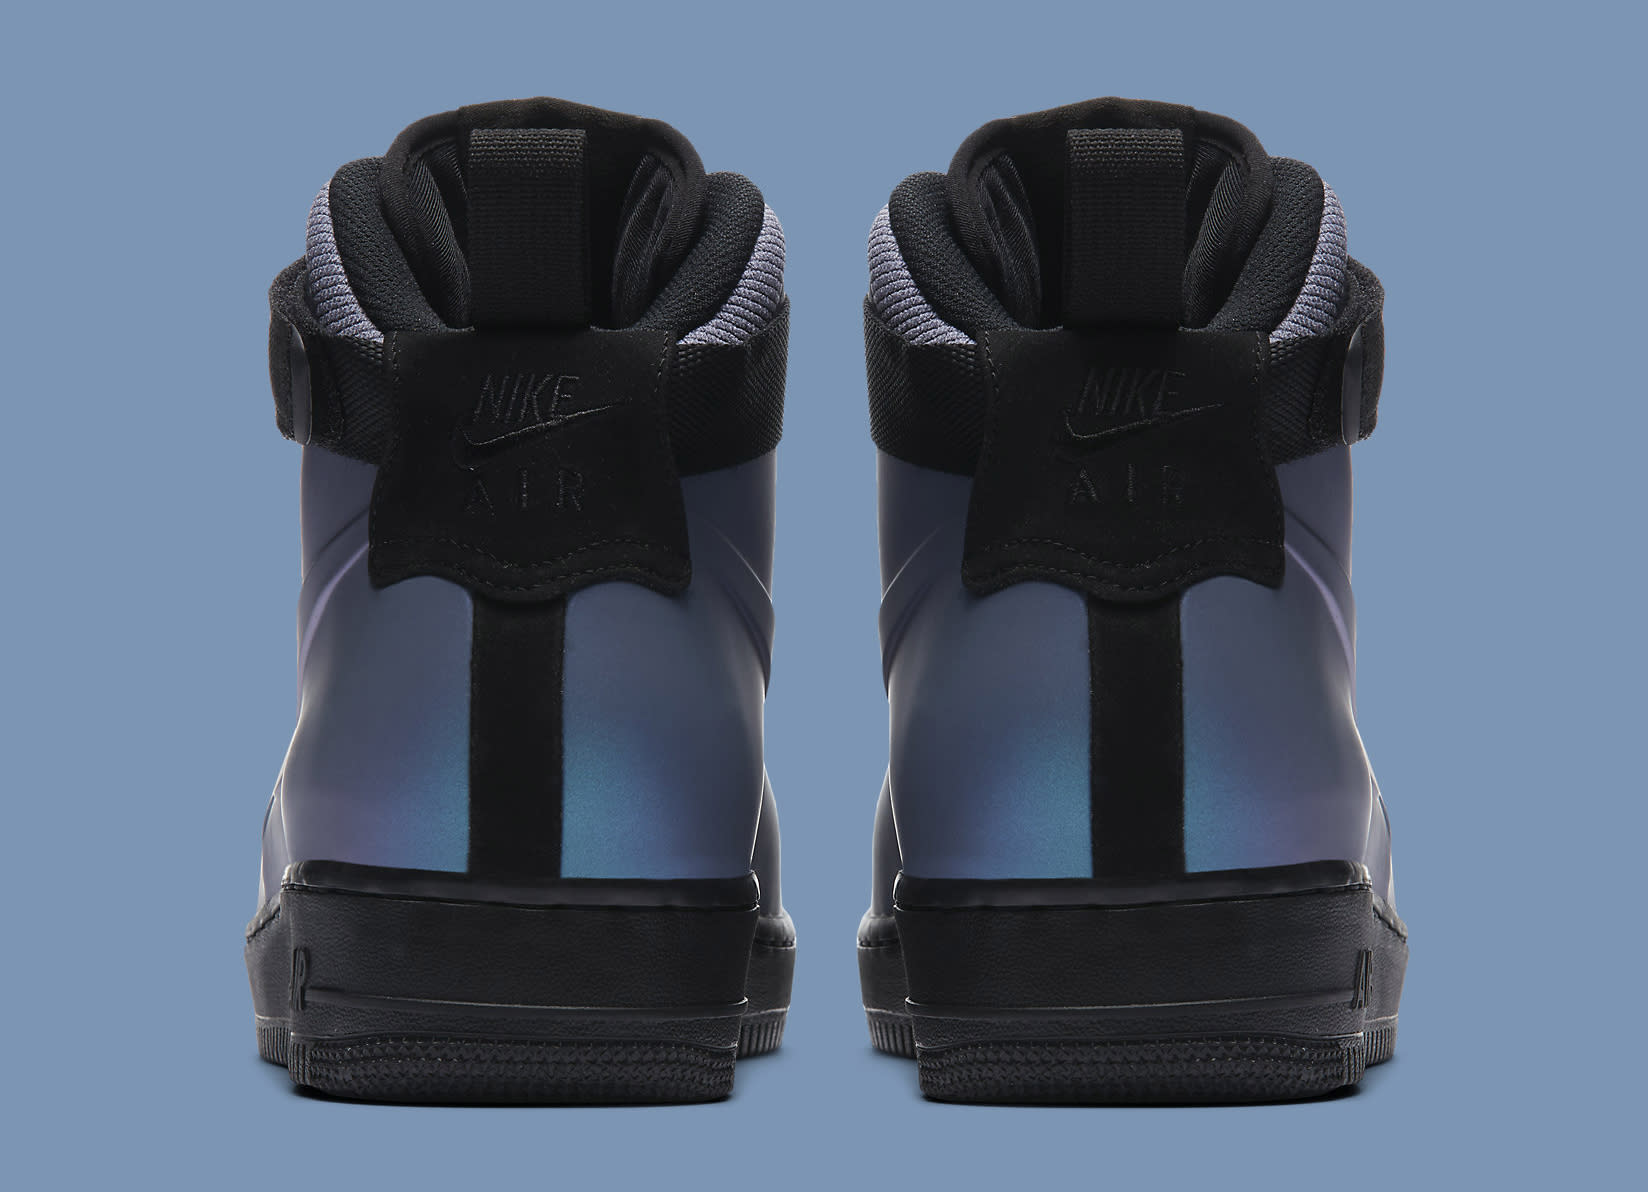 Nike Air Force 1 Foamposite Light Carbon AH6771-002 Heel